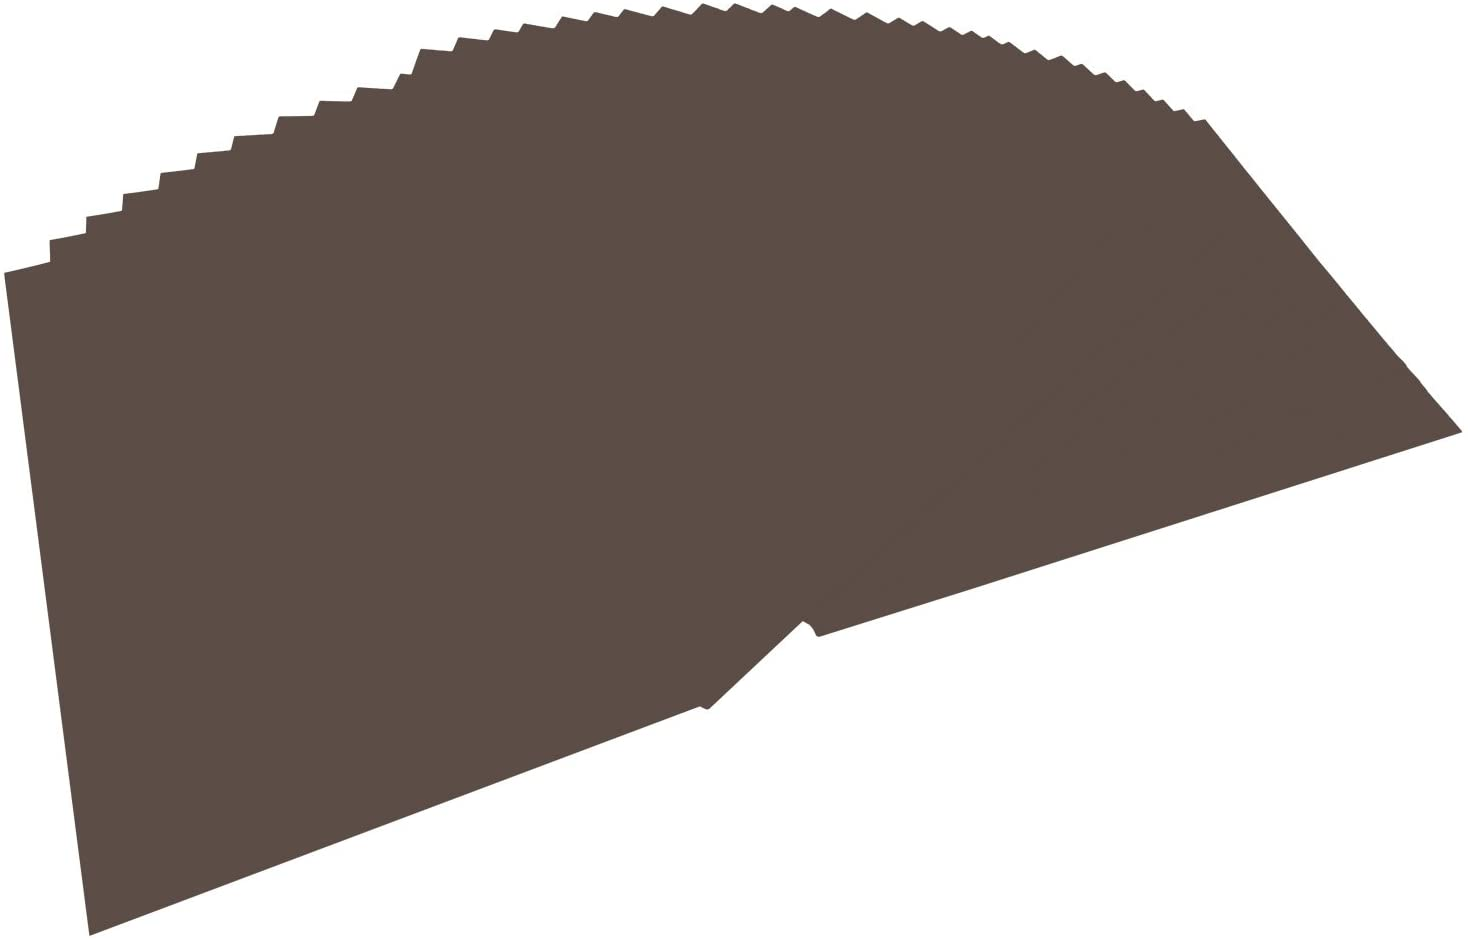 folia 6470 - Tonpapier dunkelbraun, DIN A4, 130 g/qm, 100 Blatt - zum Basteln und kreativen Gestalte